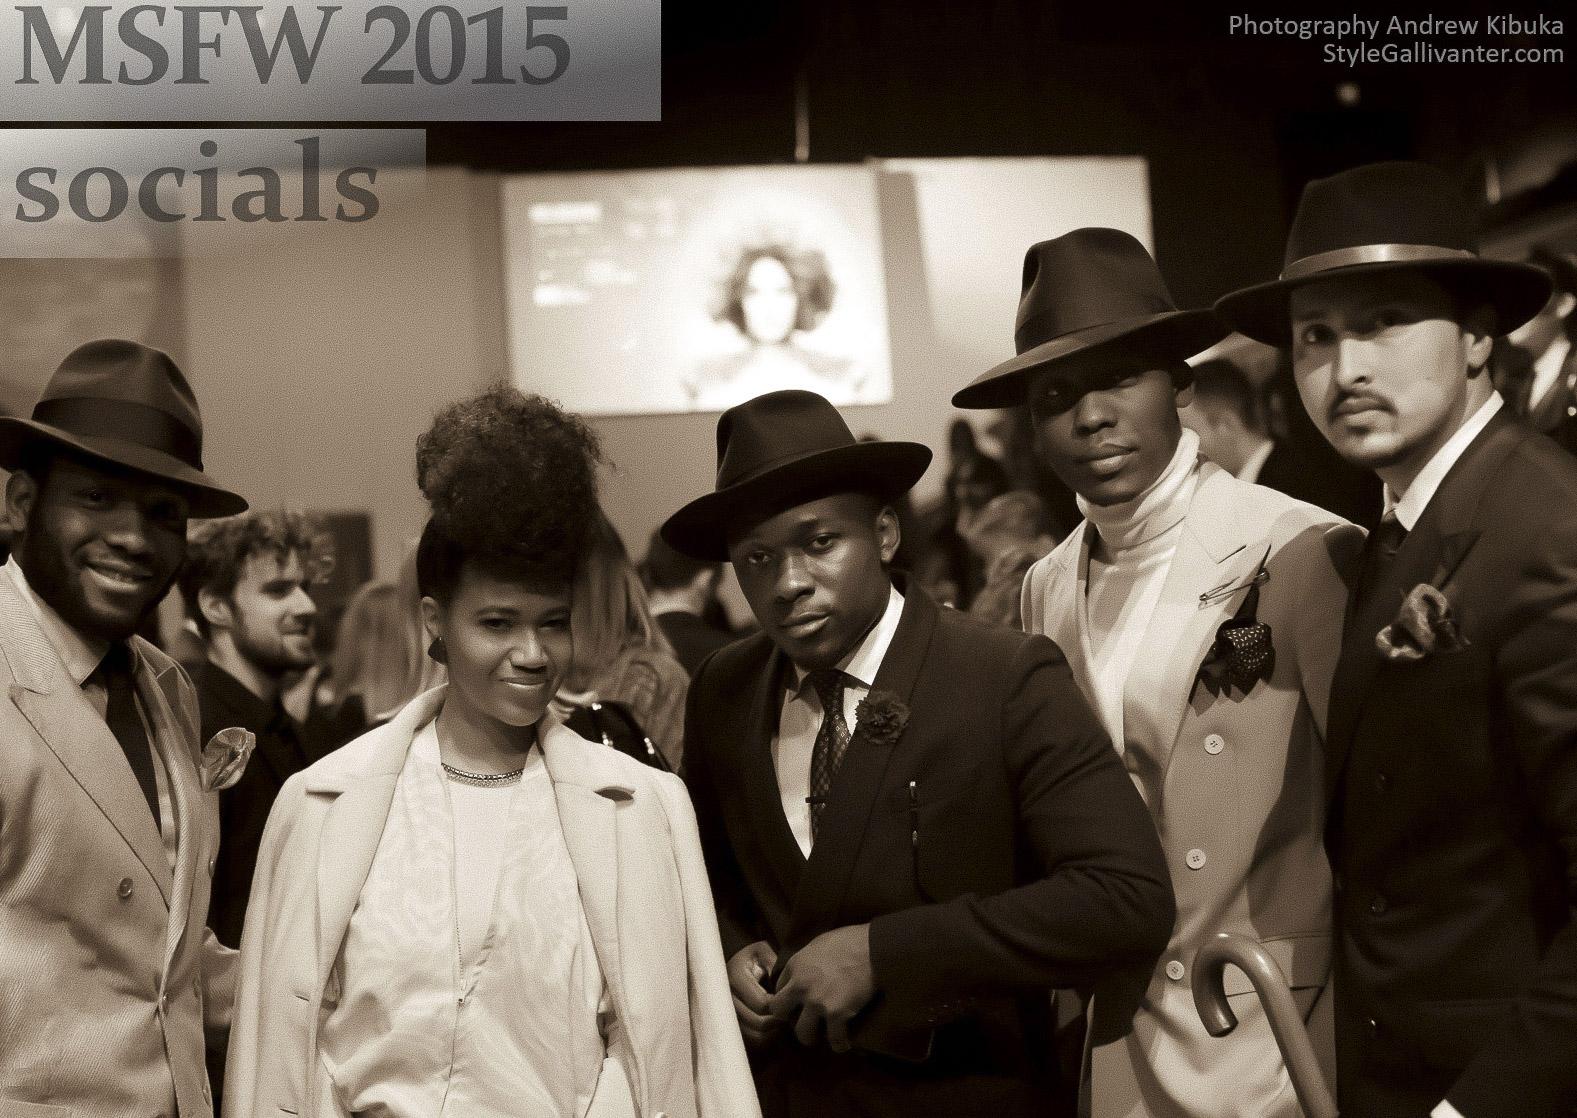 copyright-stylegallivanter.com_mr-runway-show-msfw-2015-15